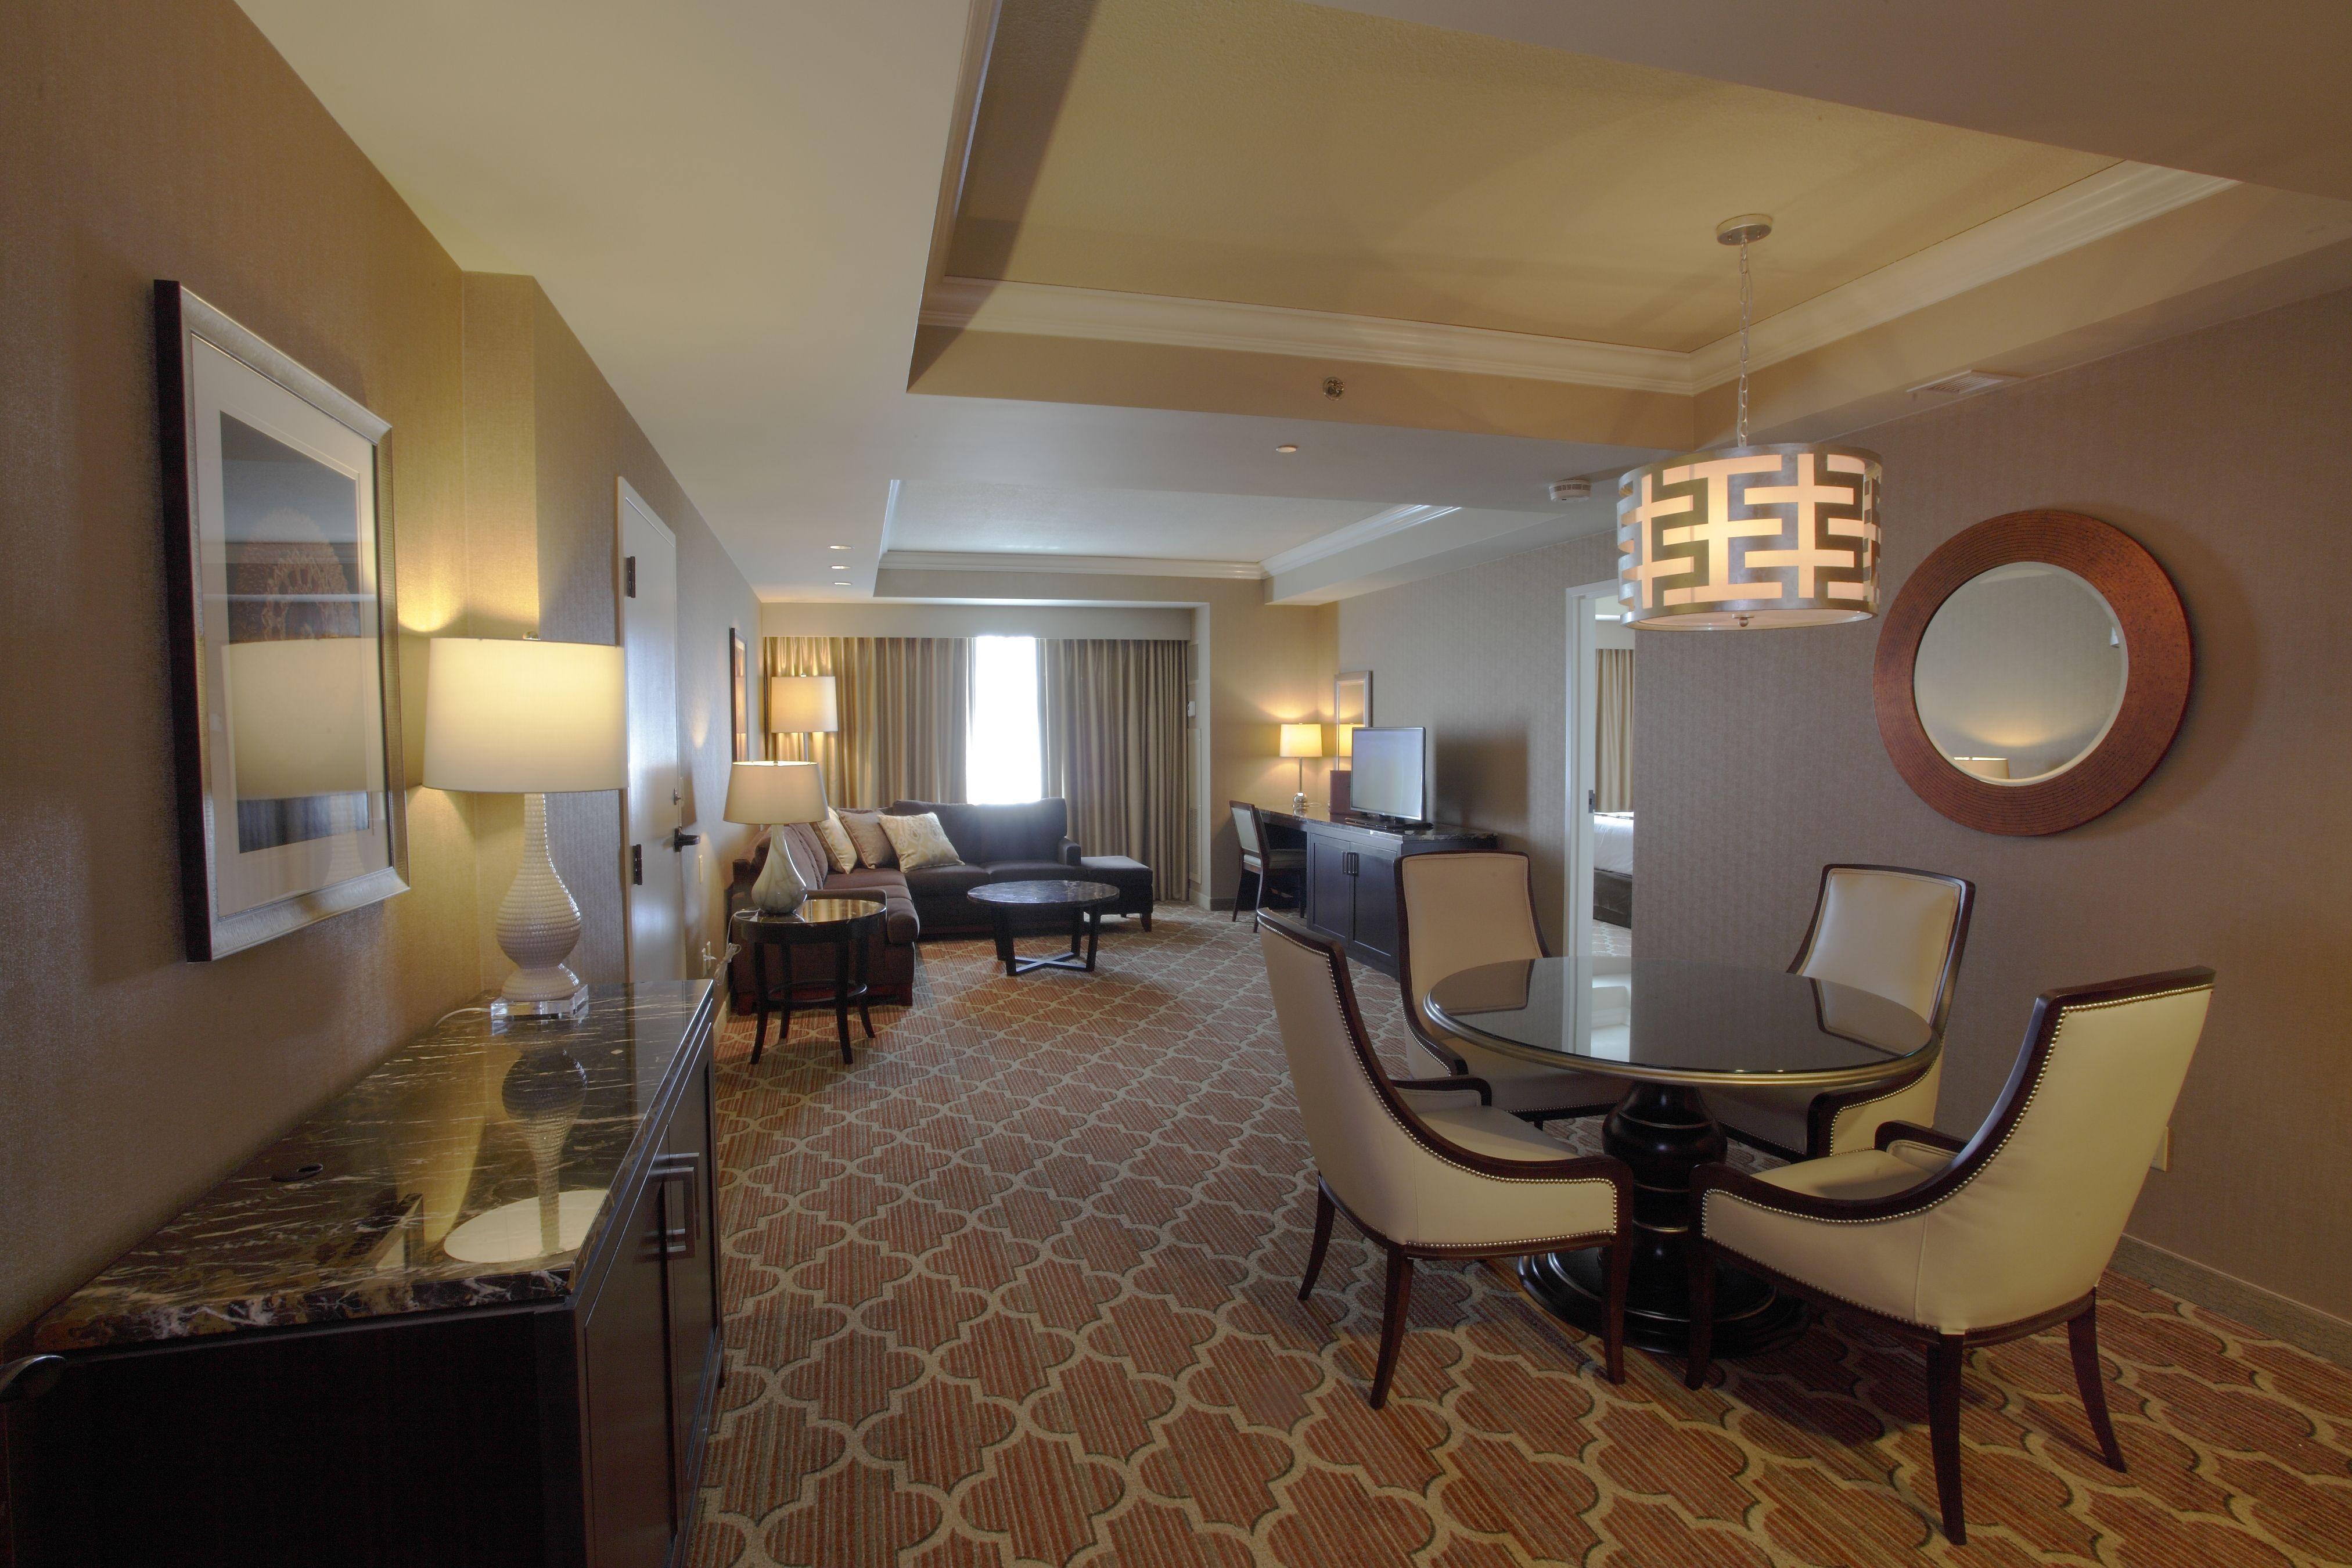 Four winds casino hotel indiana legal gambling